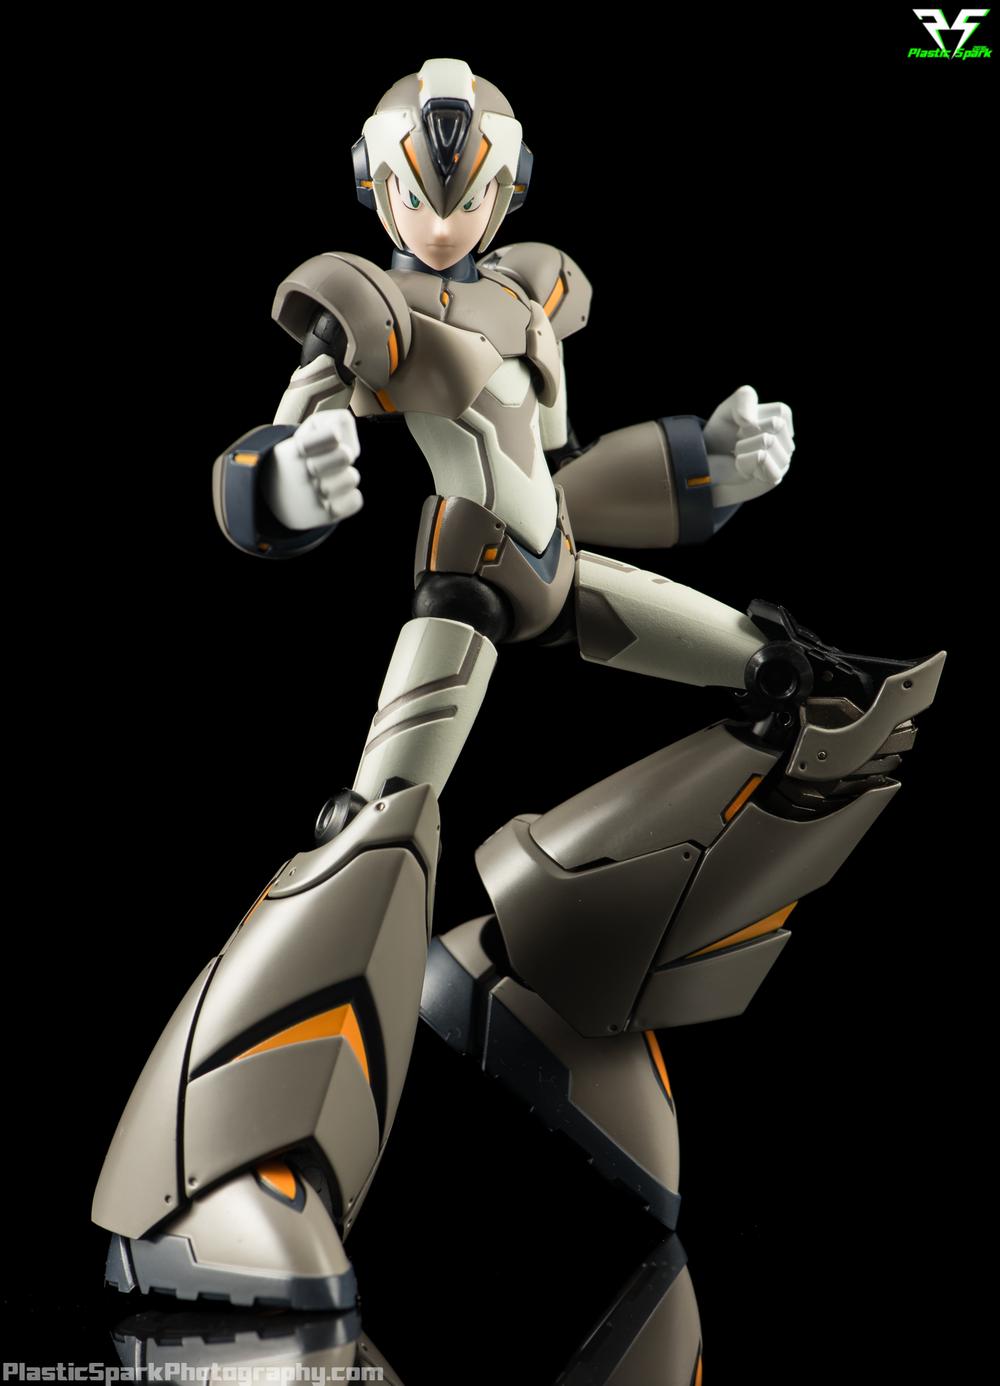 Truforce-Megaman-X-KS-Variant-(1-of-3).png